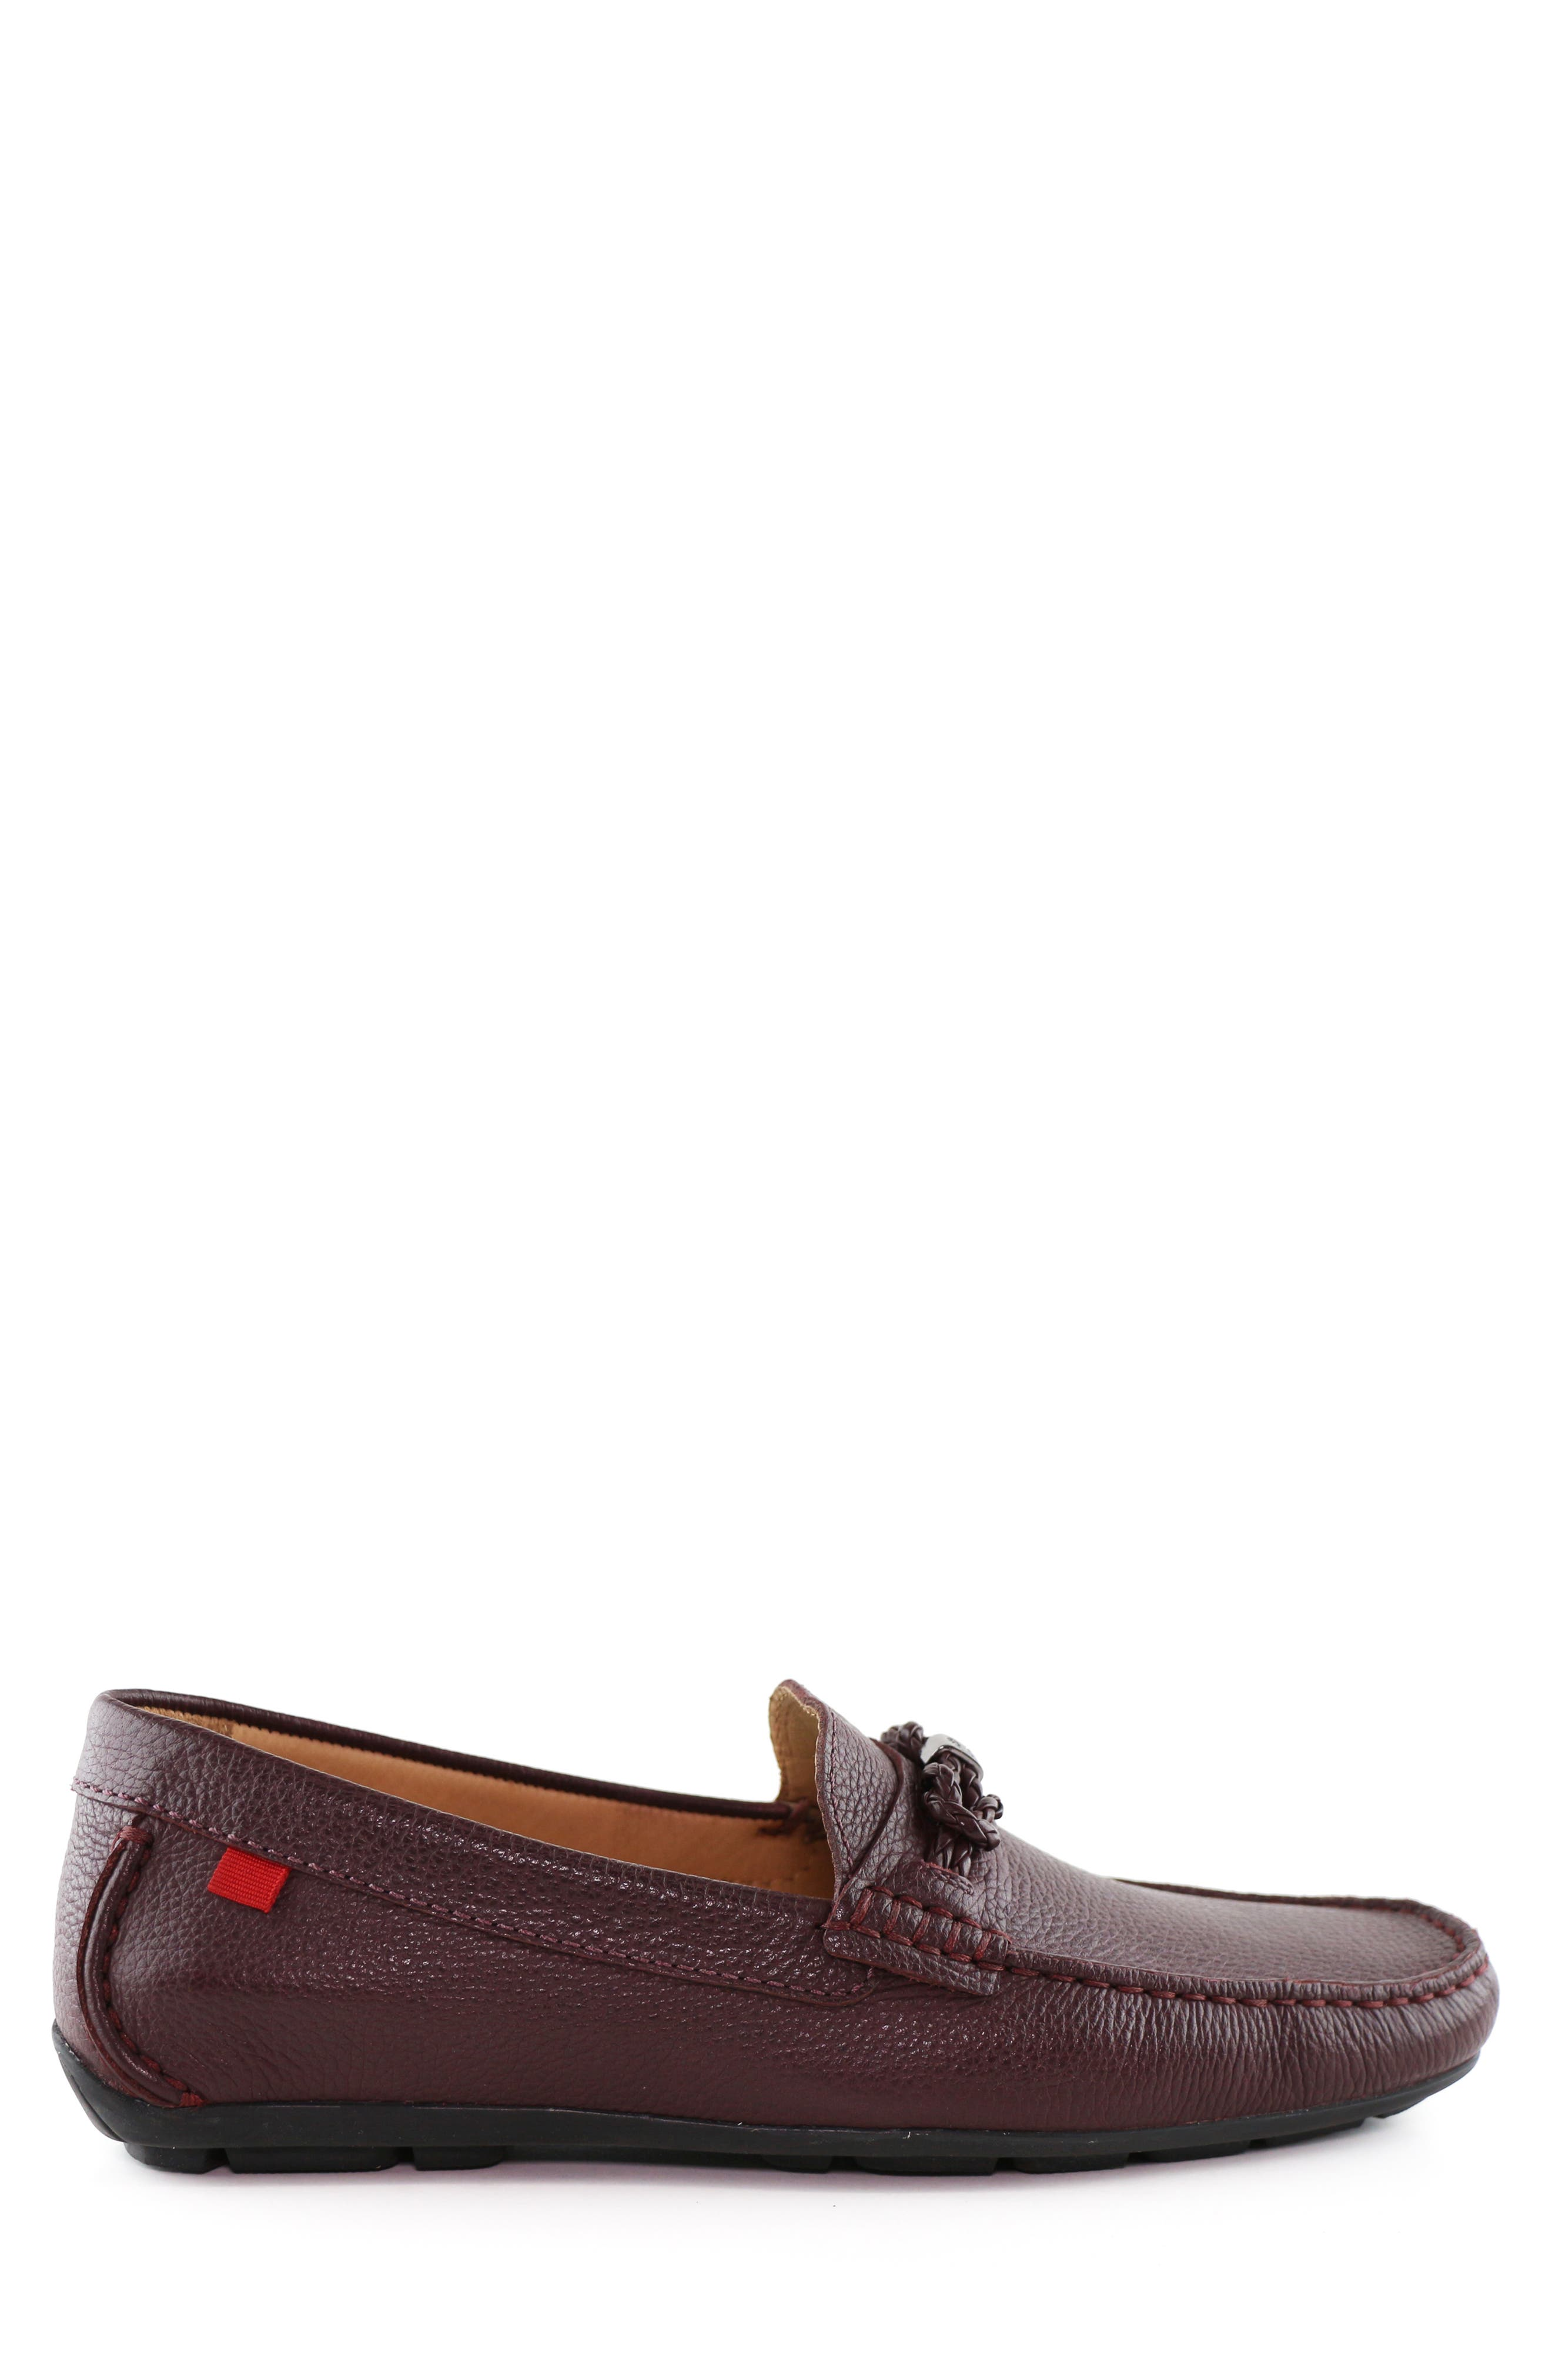 MARC JOSEPH NEW YORK, West Village Driving Shoe, Alternate thumbnail 3, color, 930